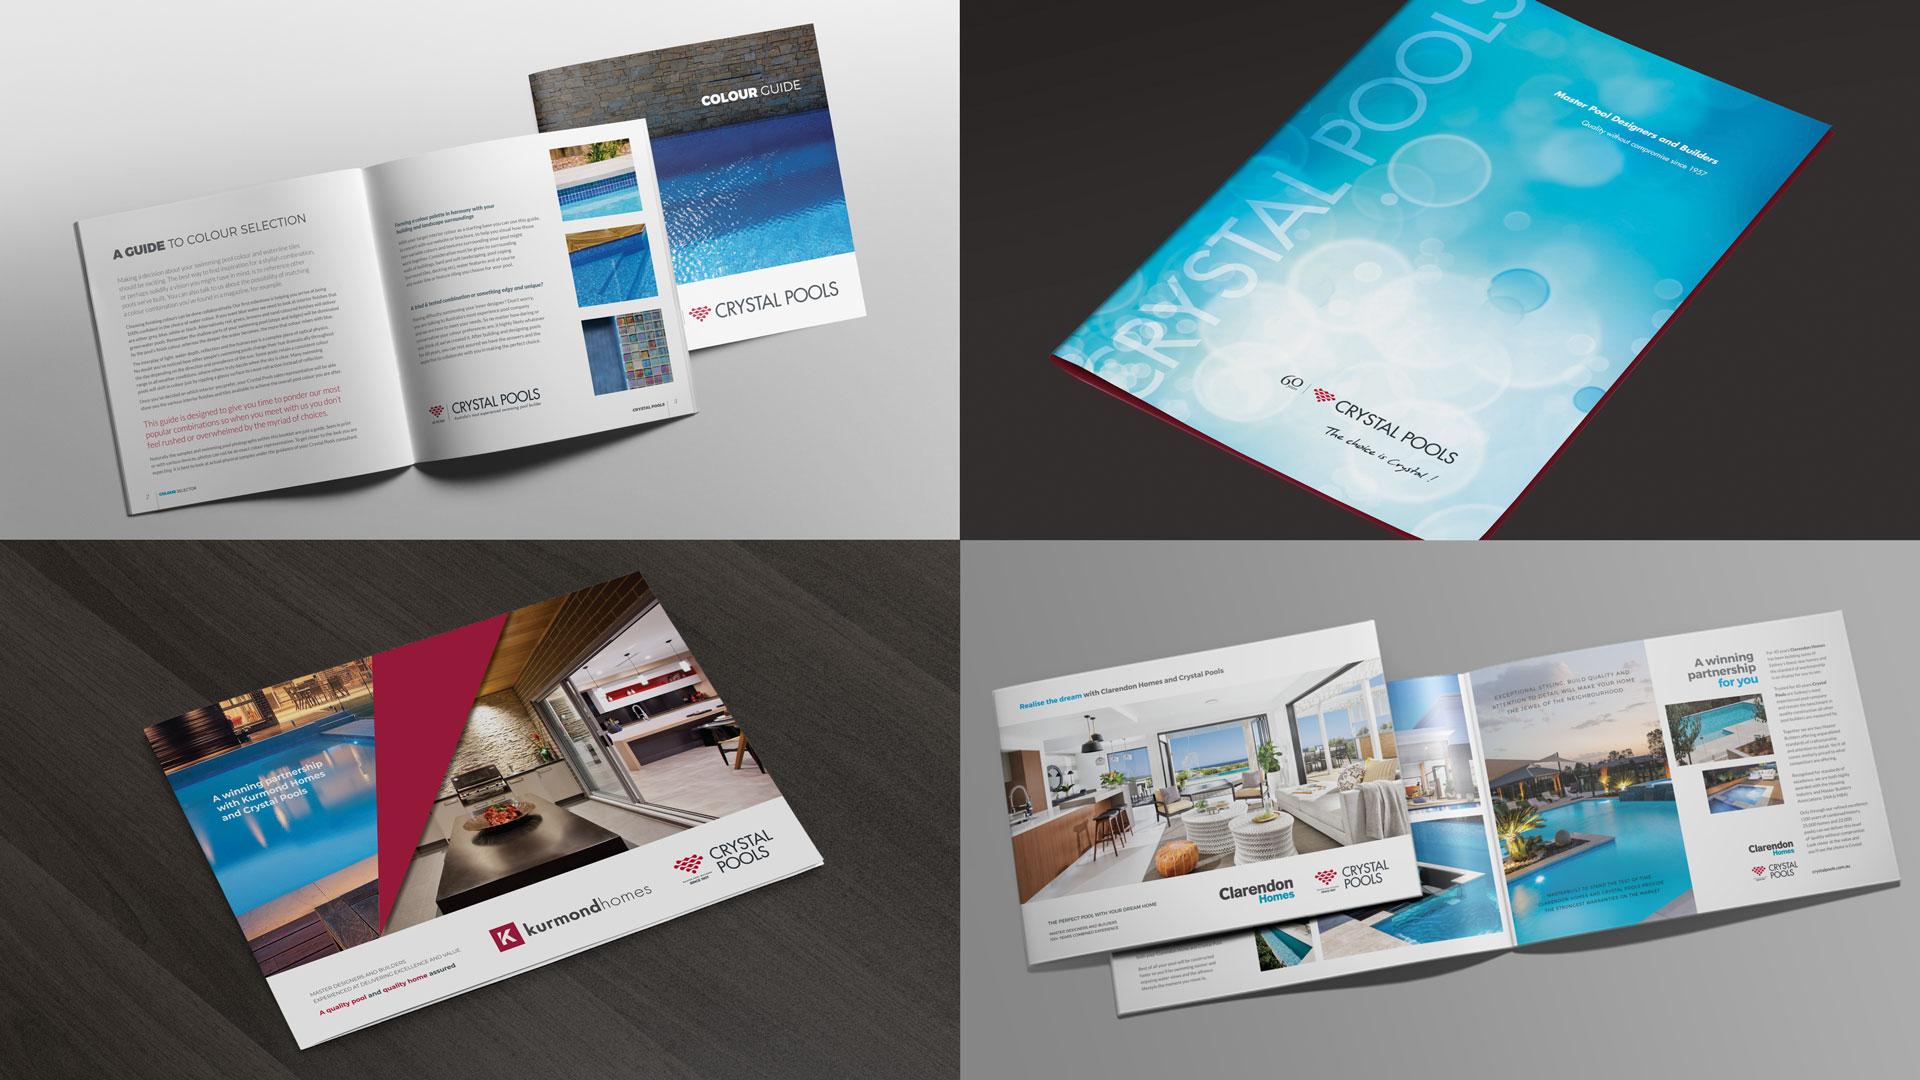 Design Print Marketing Brochures, Company Folders